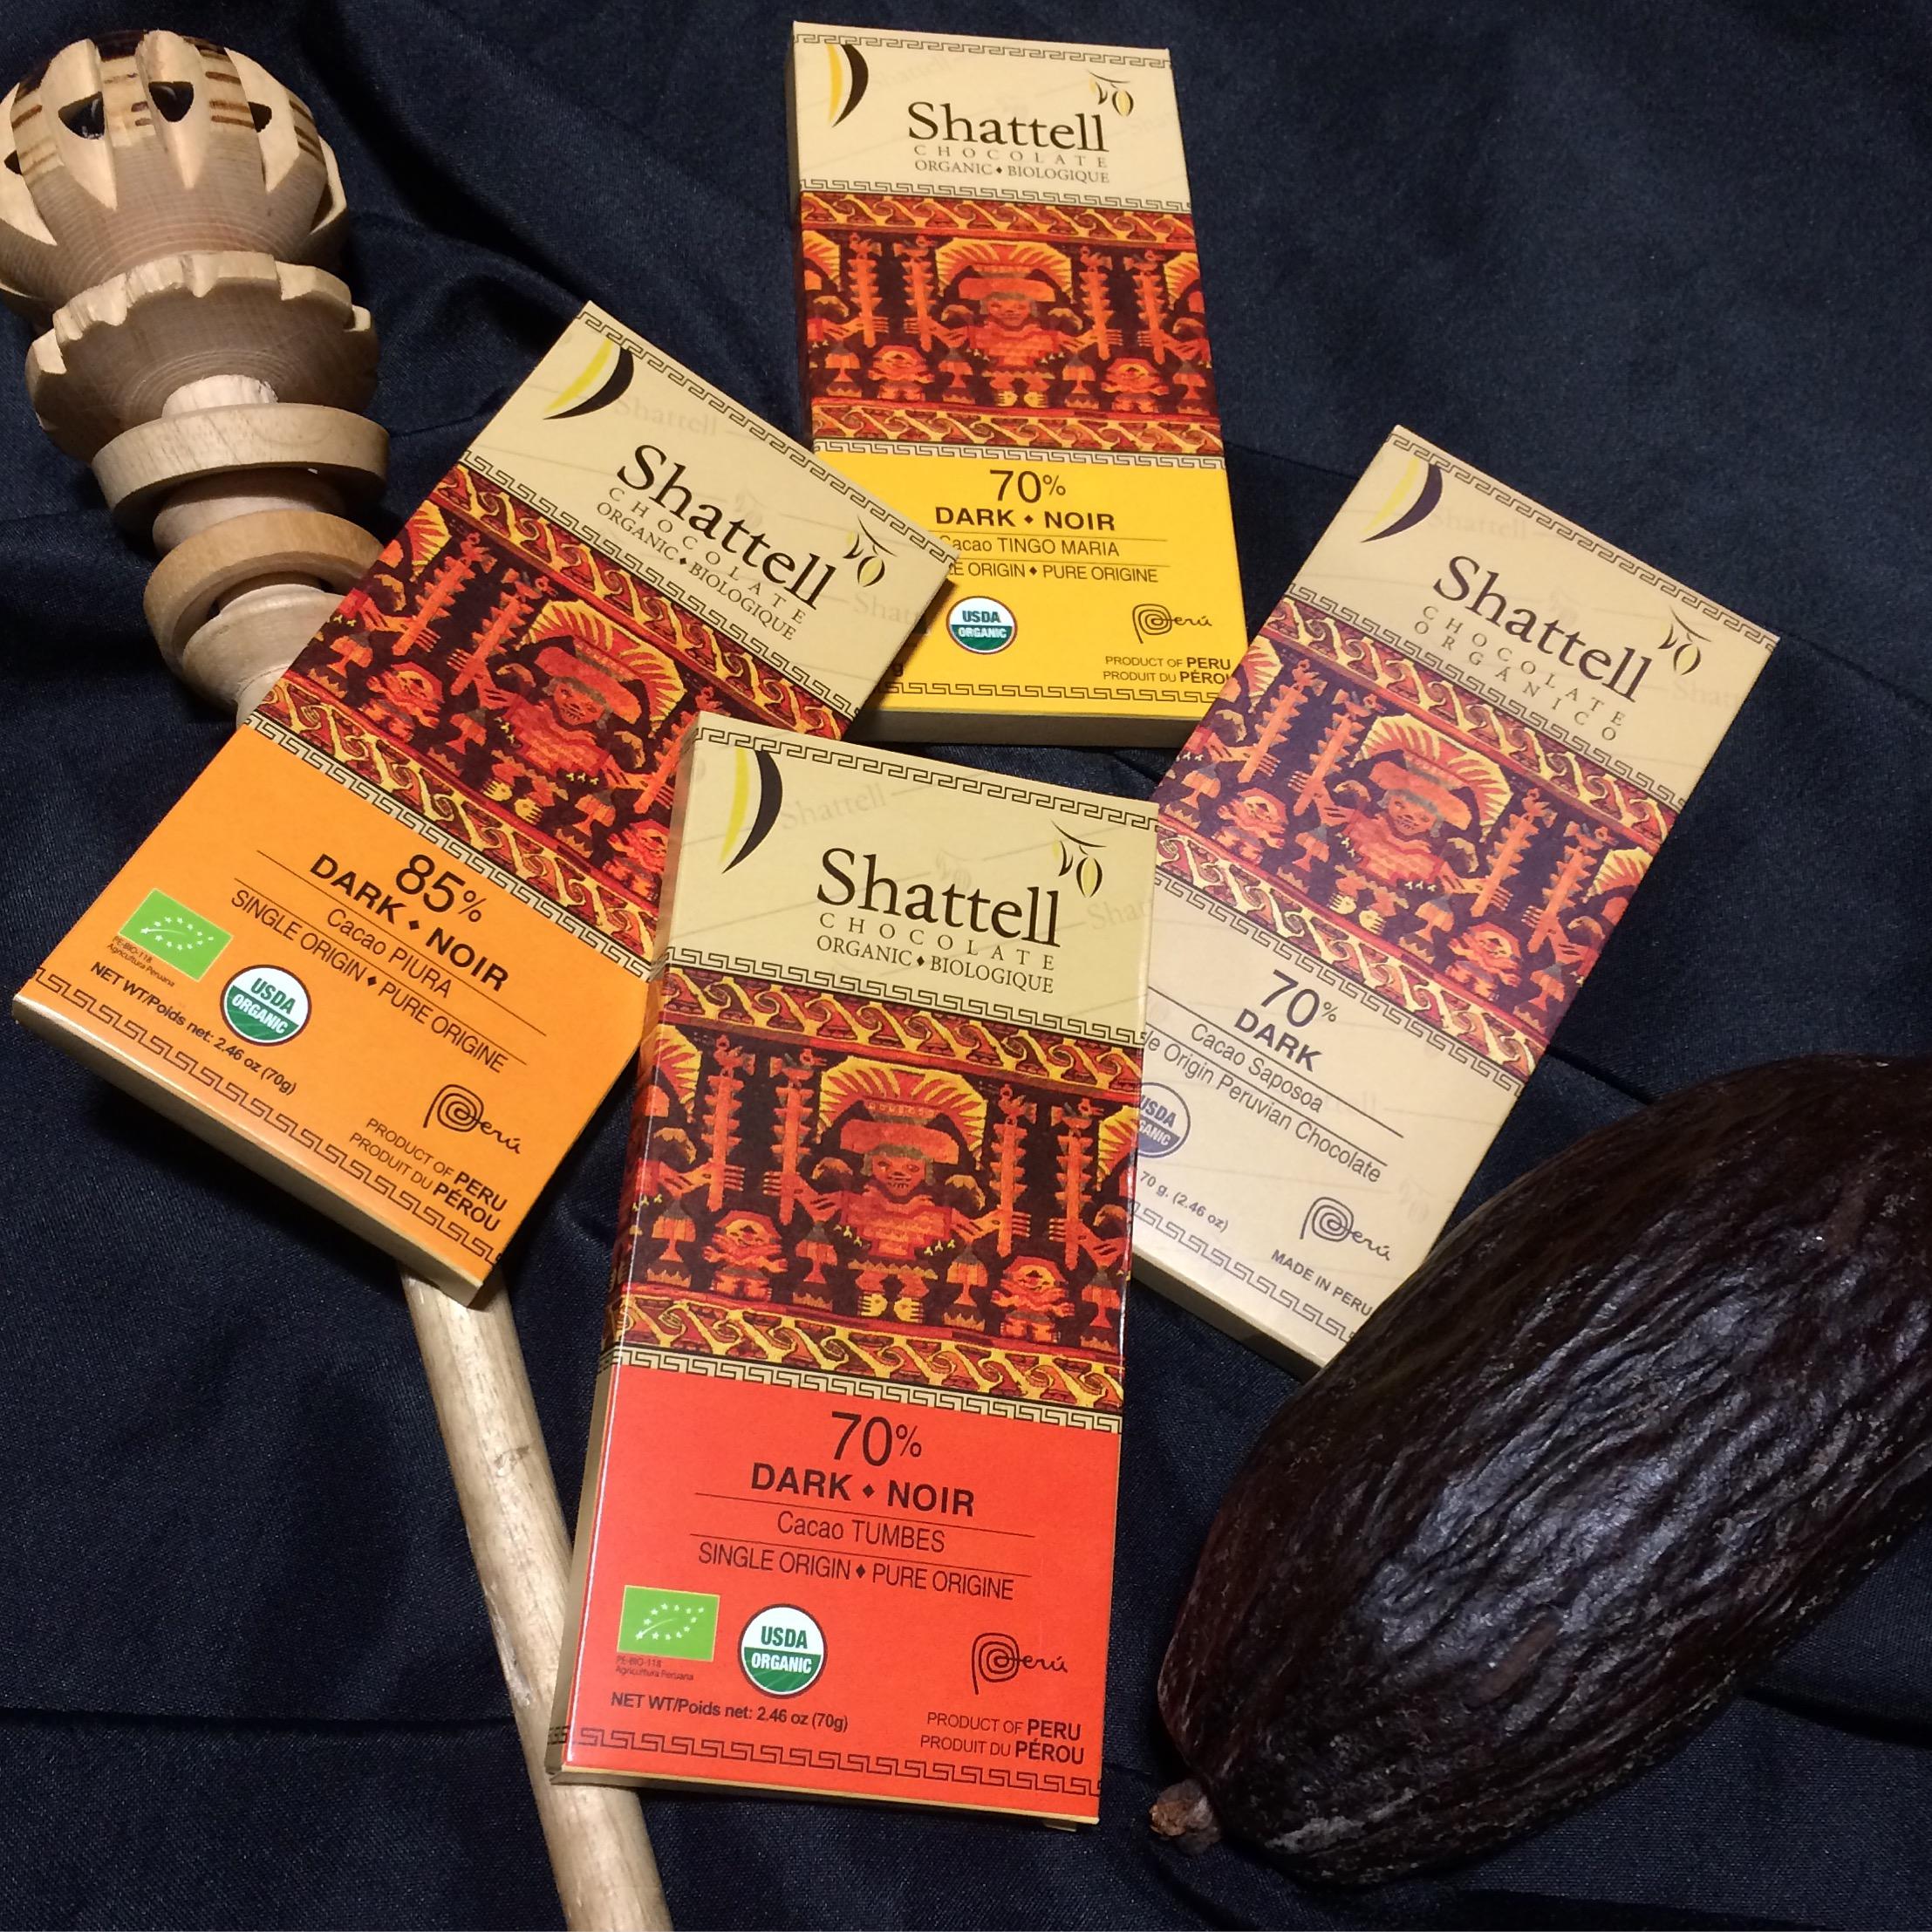 Shattell Chocolate